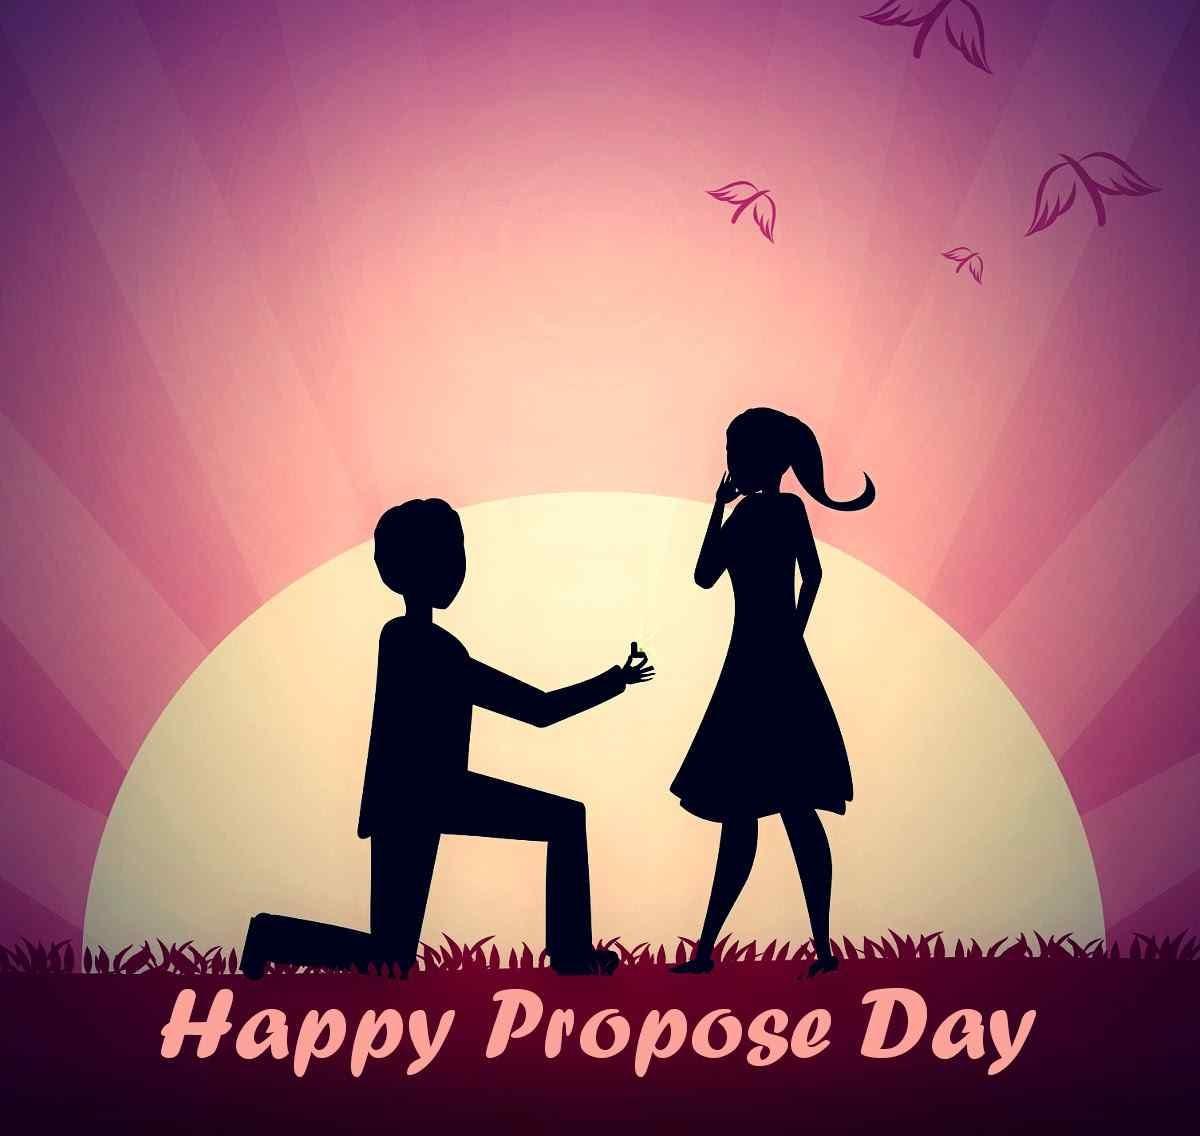 Happy Propose Day Shayari in Hindi for Girlfriend Boyfriend GF BF Wife Husband 2018